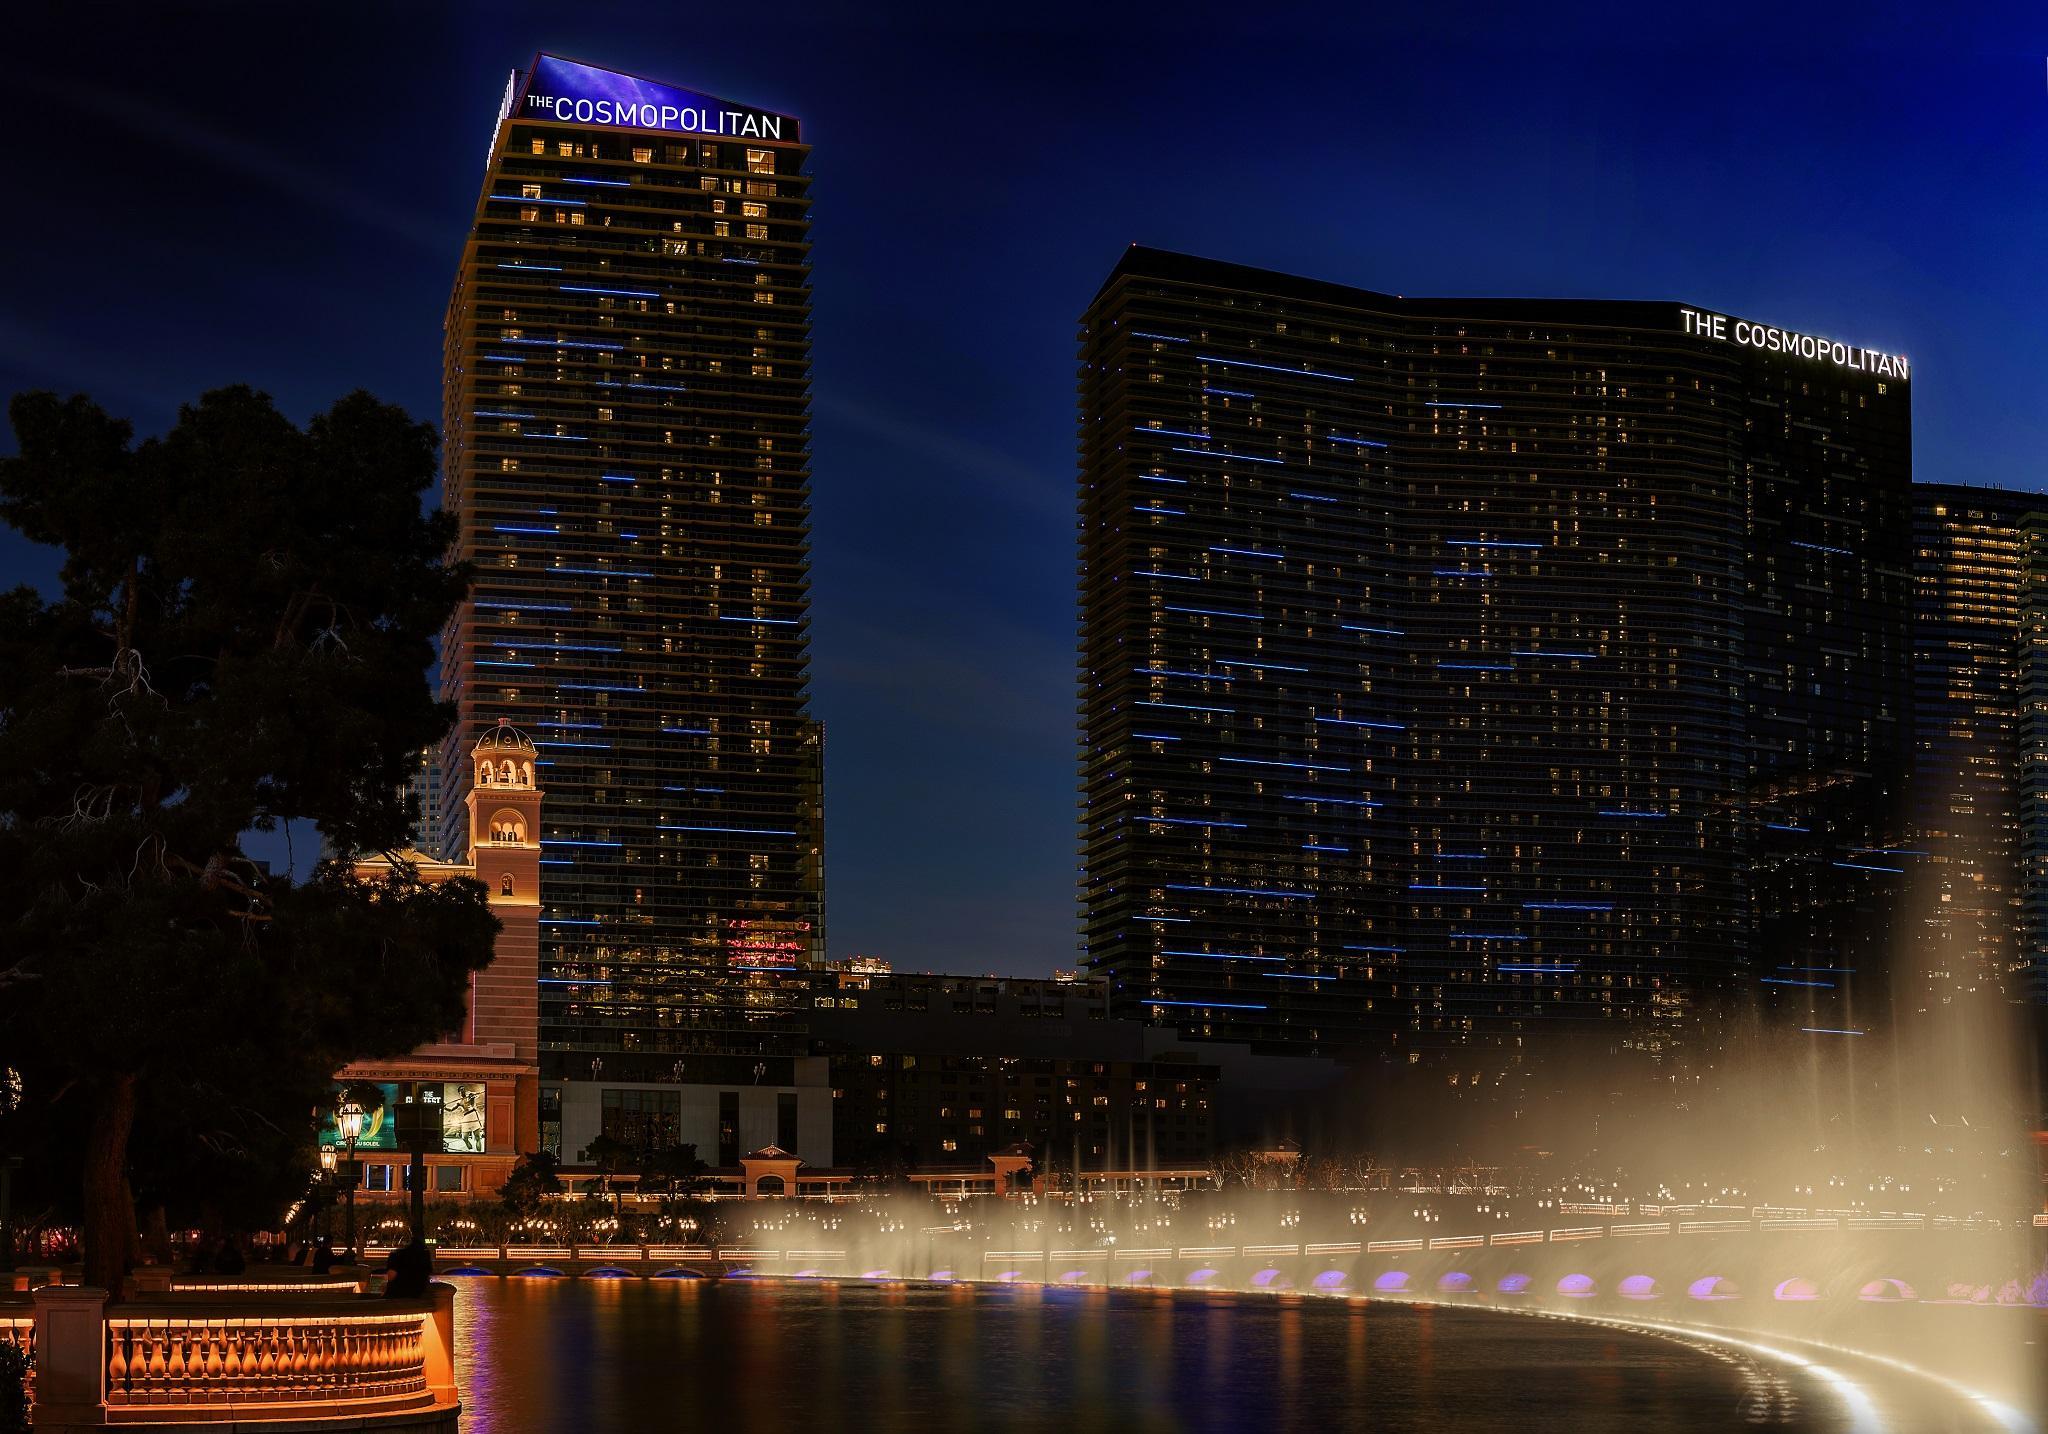 More about The Cosmopolitan of Las Vegas